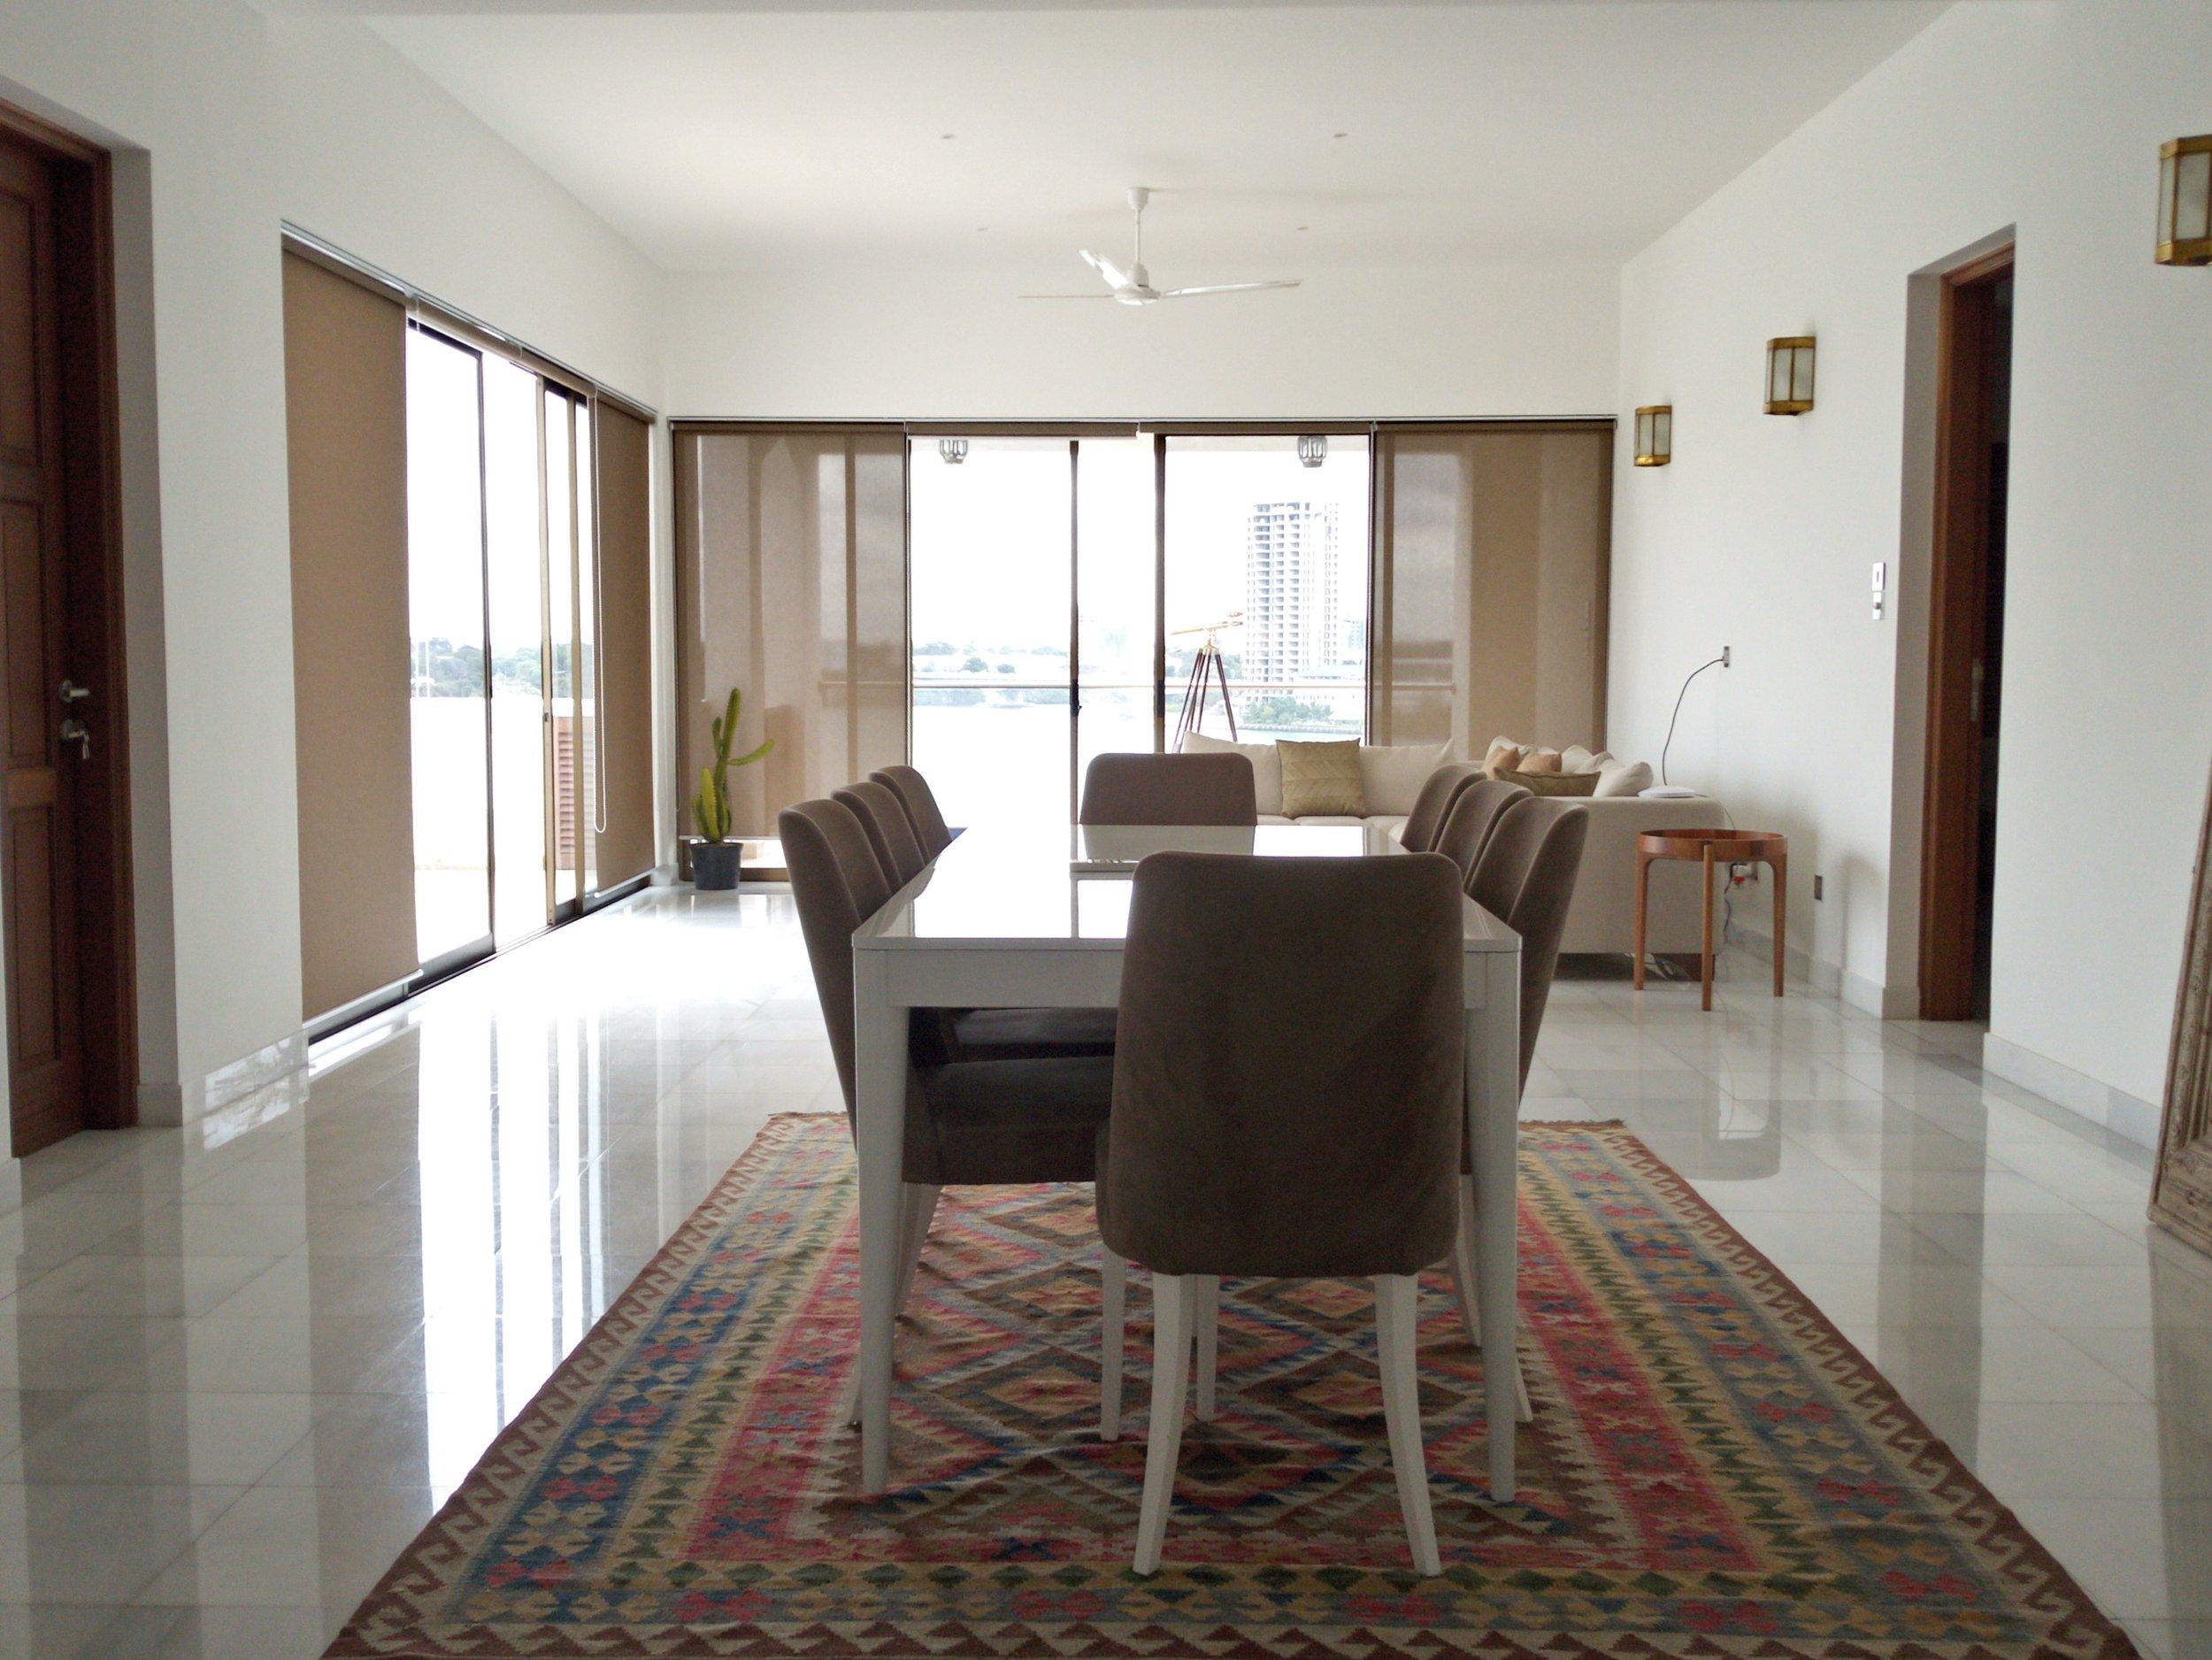 Penthouse-4 Bedroom- all ensuite.jpg